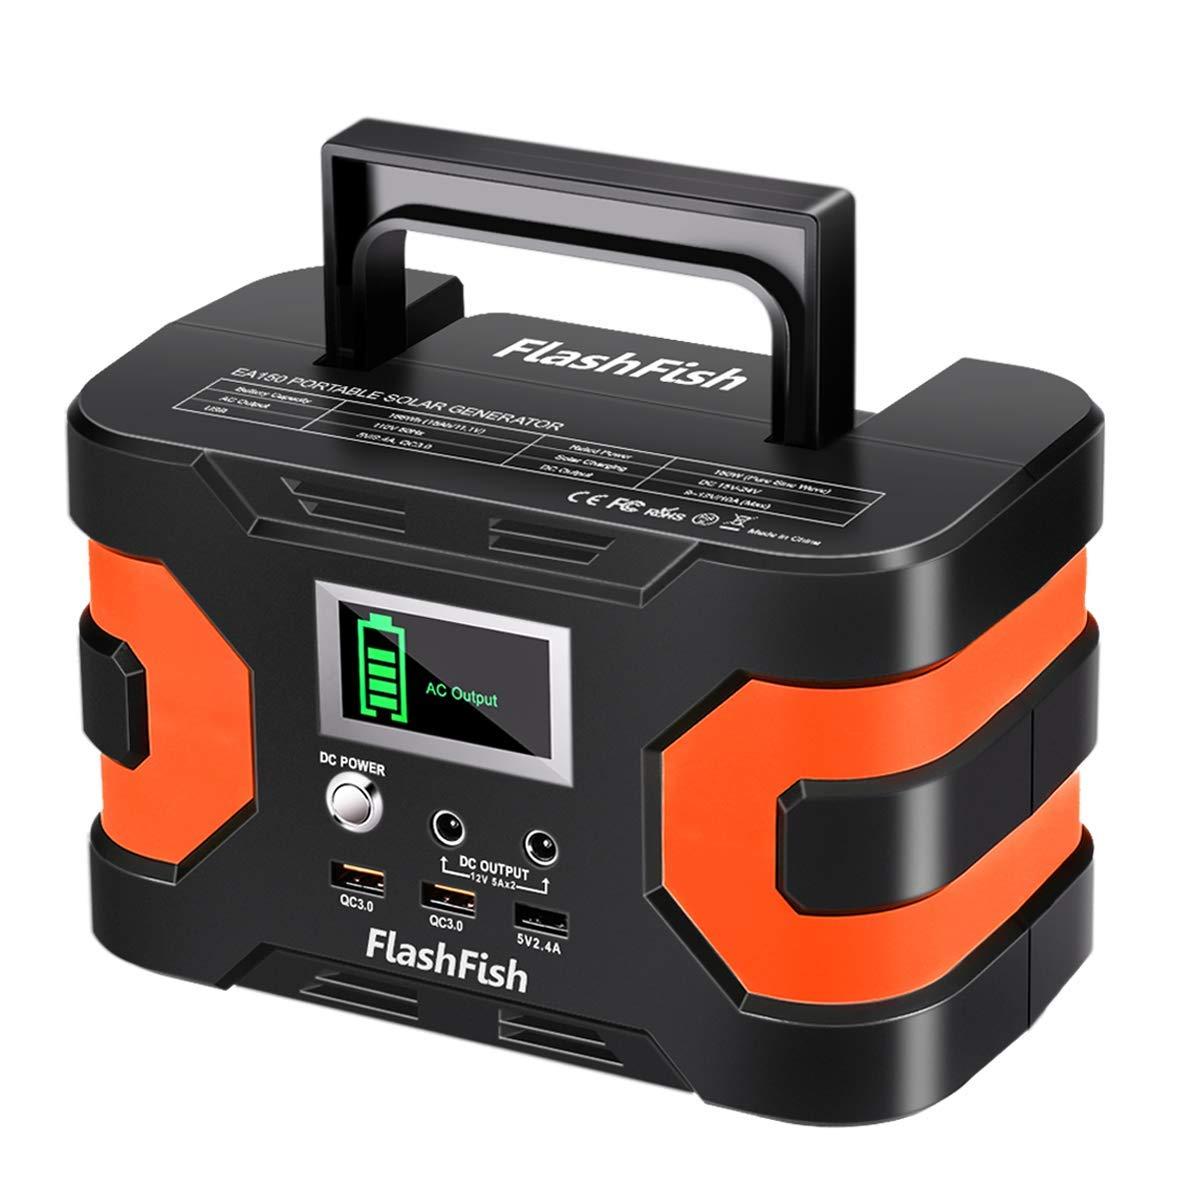 45000mAh Portable Solar Generator, FlashFish 150W Peak Power 200W Power Station Solar Generator, 110V AC Outlet QC3.0 USB Ports Battery Pack for CPAP Outdoor Camping Trip Emergency by FF FLASHFISH